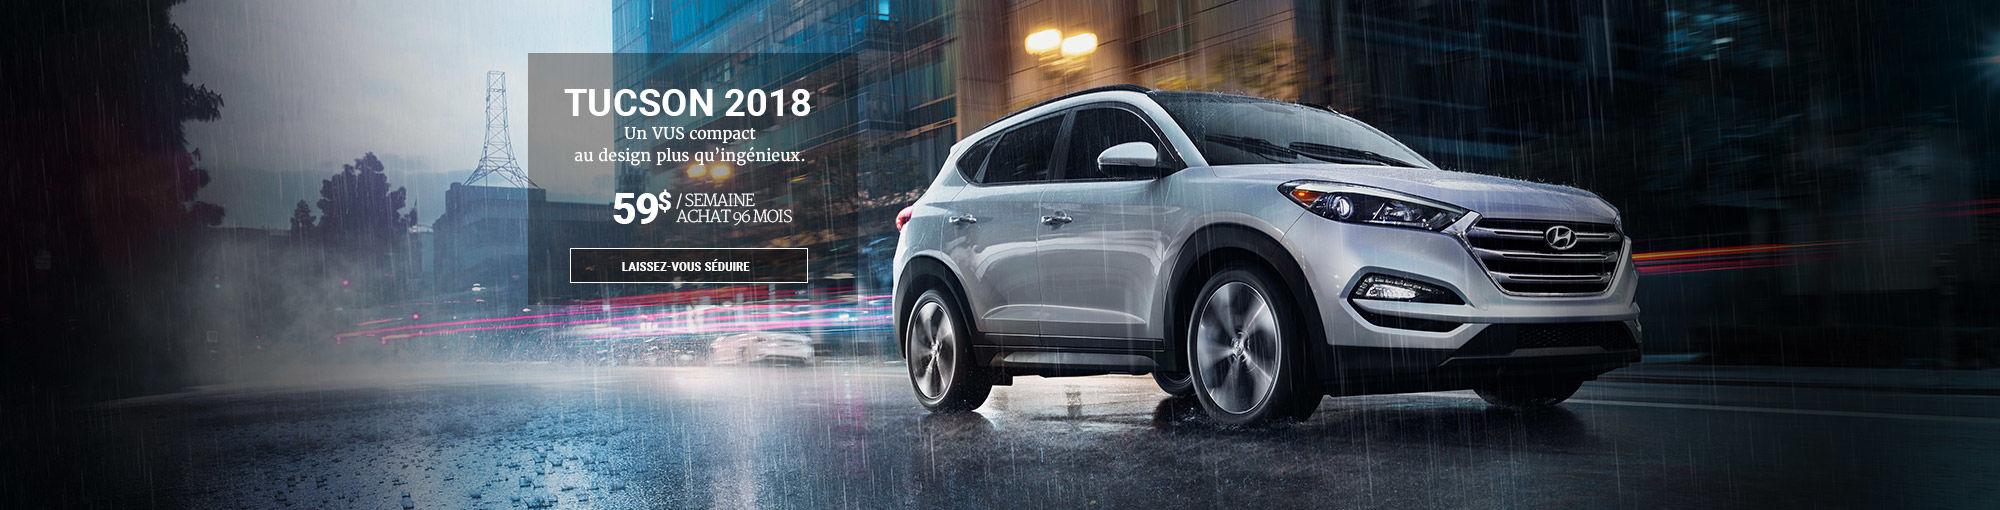 Hyundai Tucson 2018 header octobre